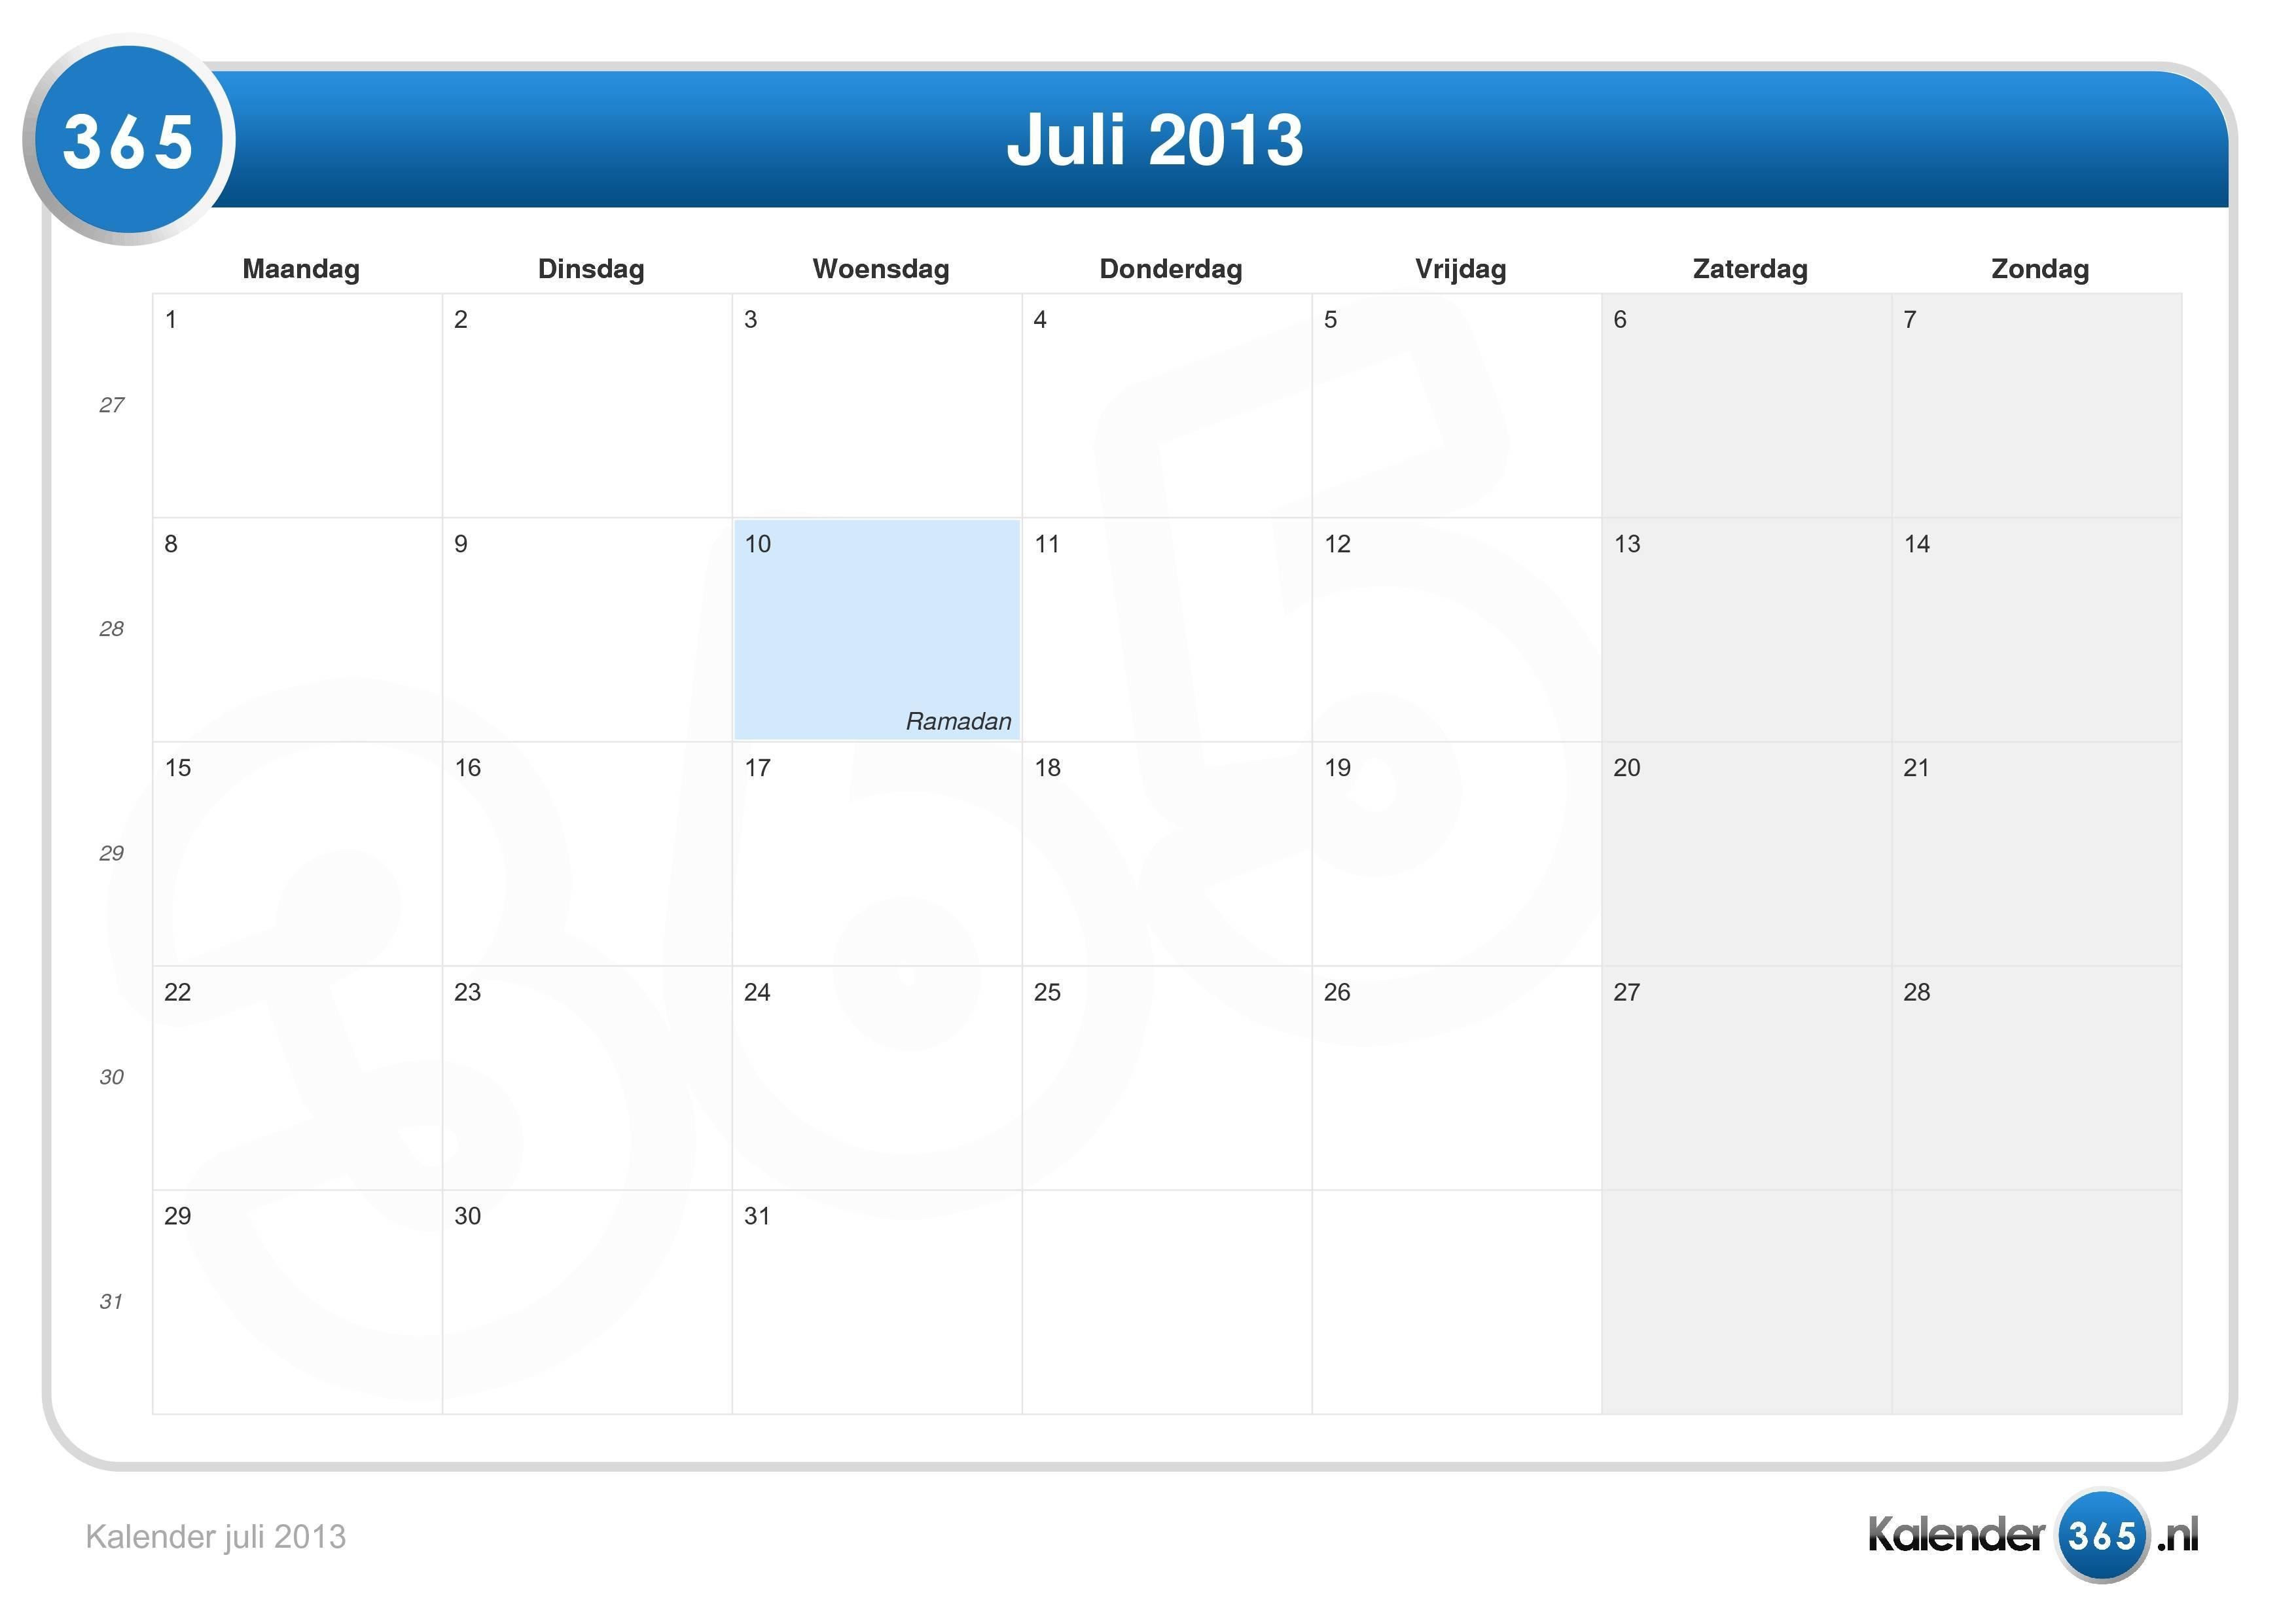 Kalender juli 2013